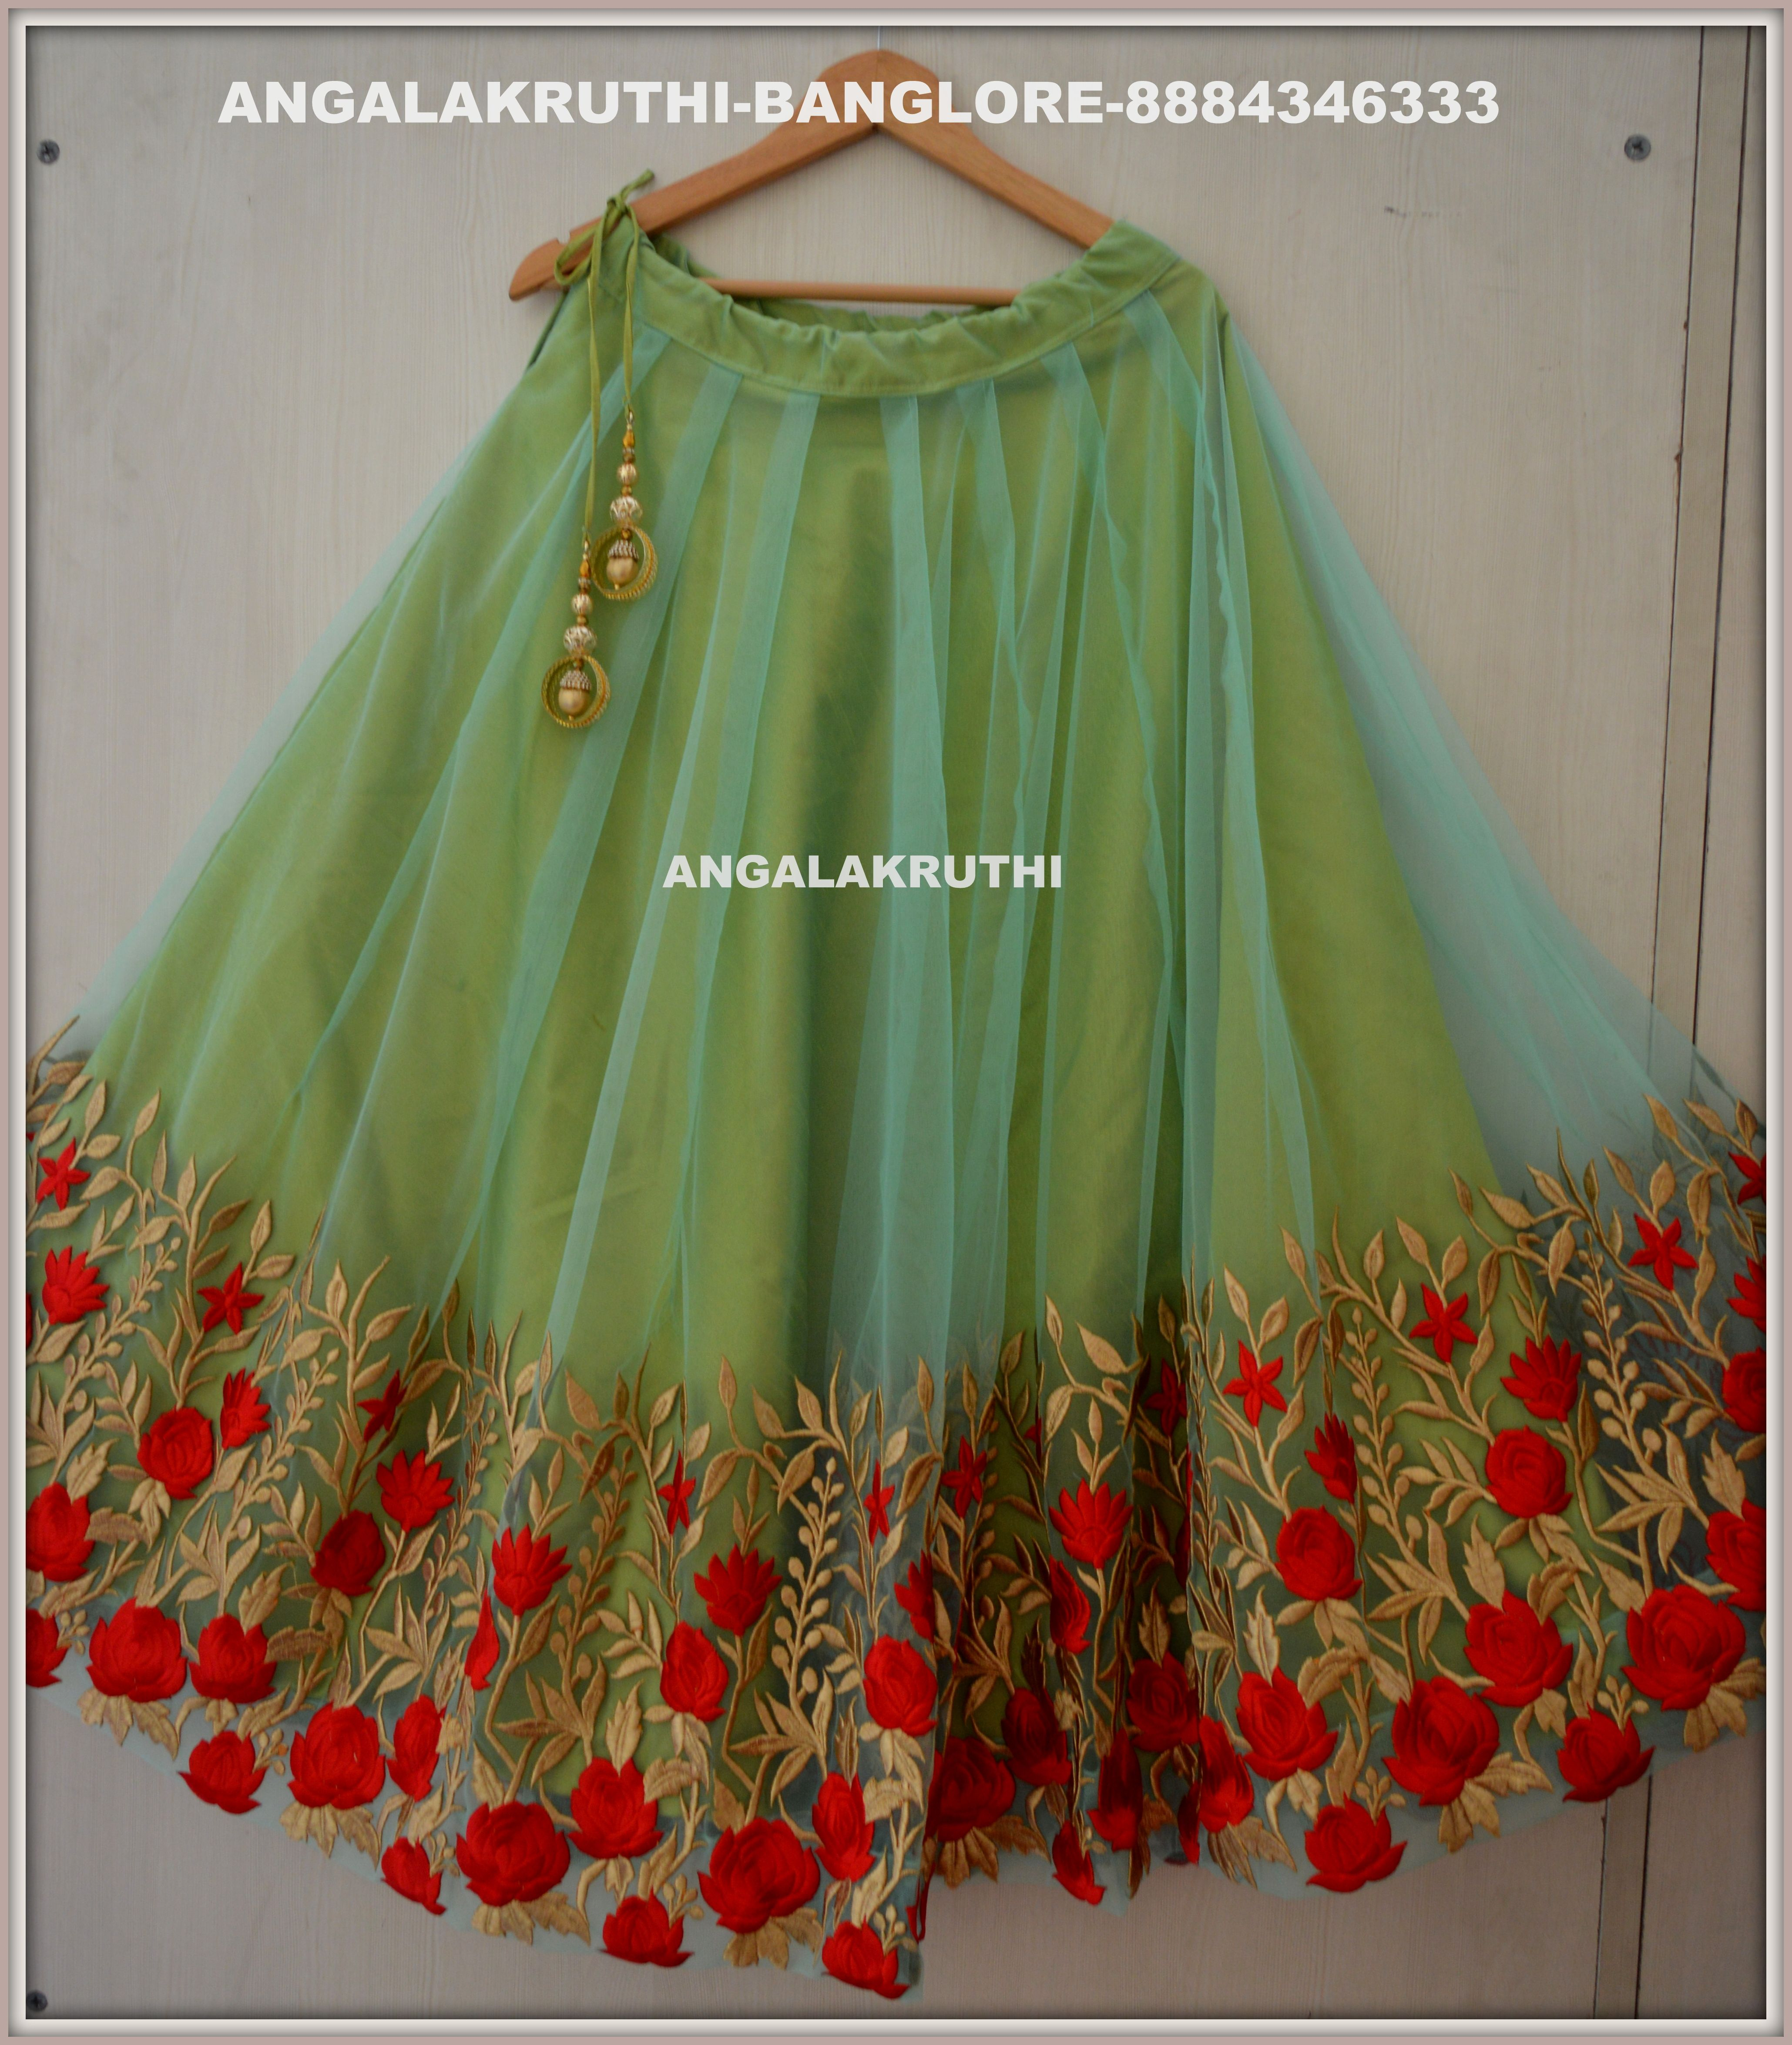 designer wear dresses in bangalore dating